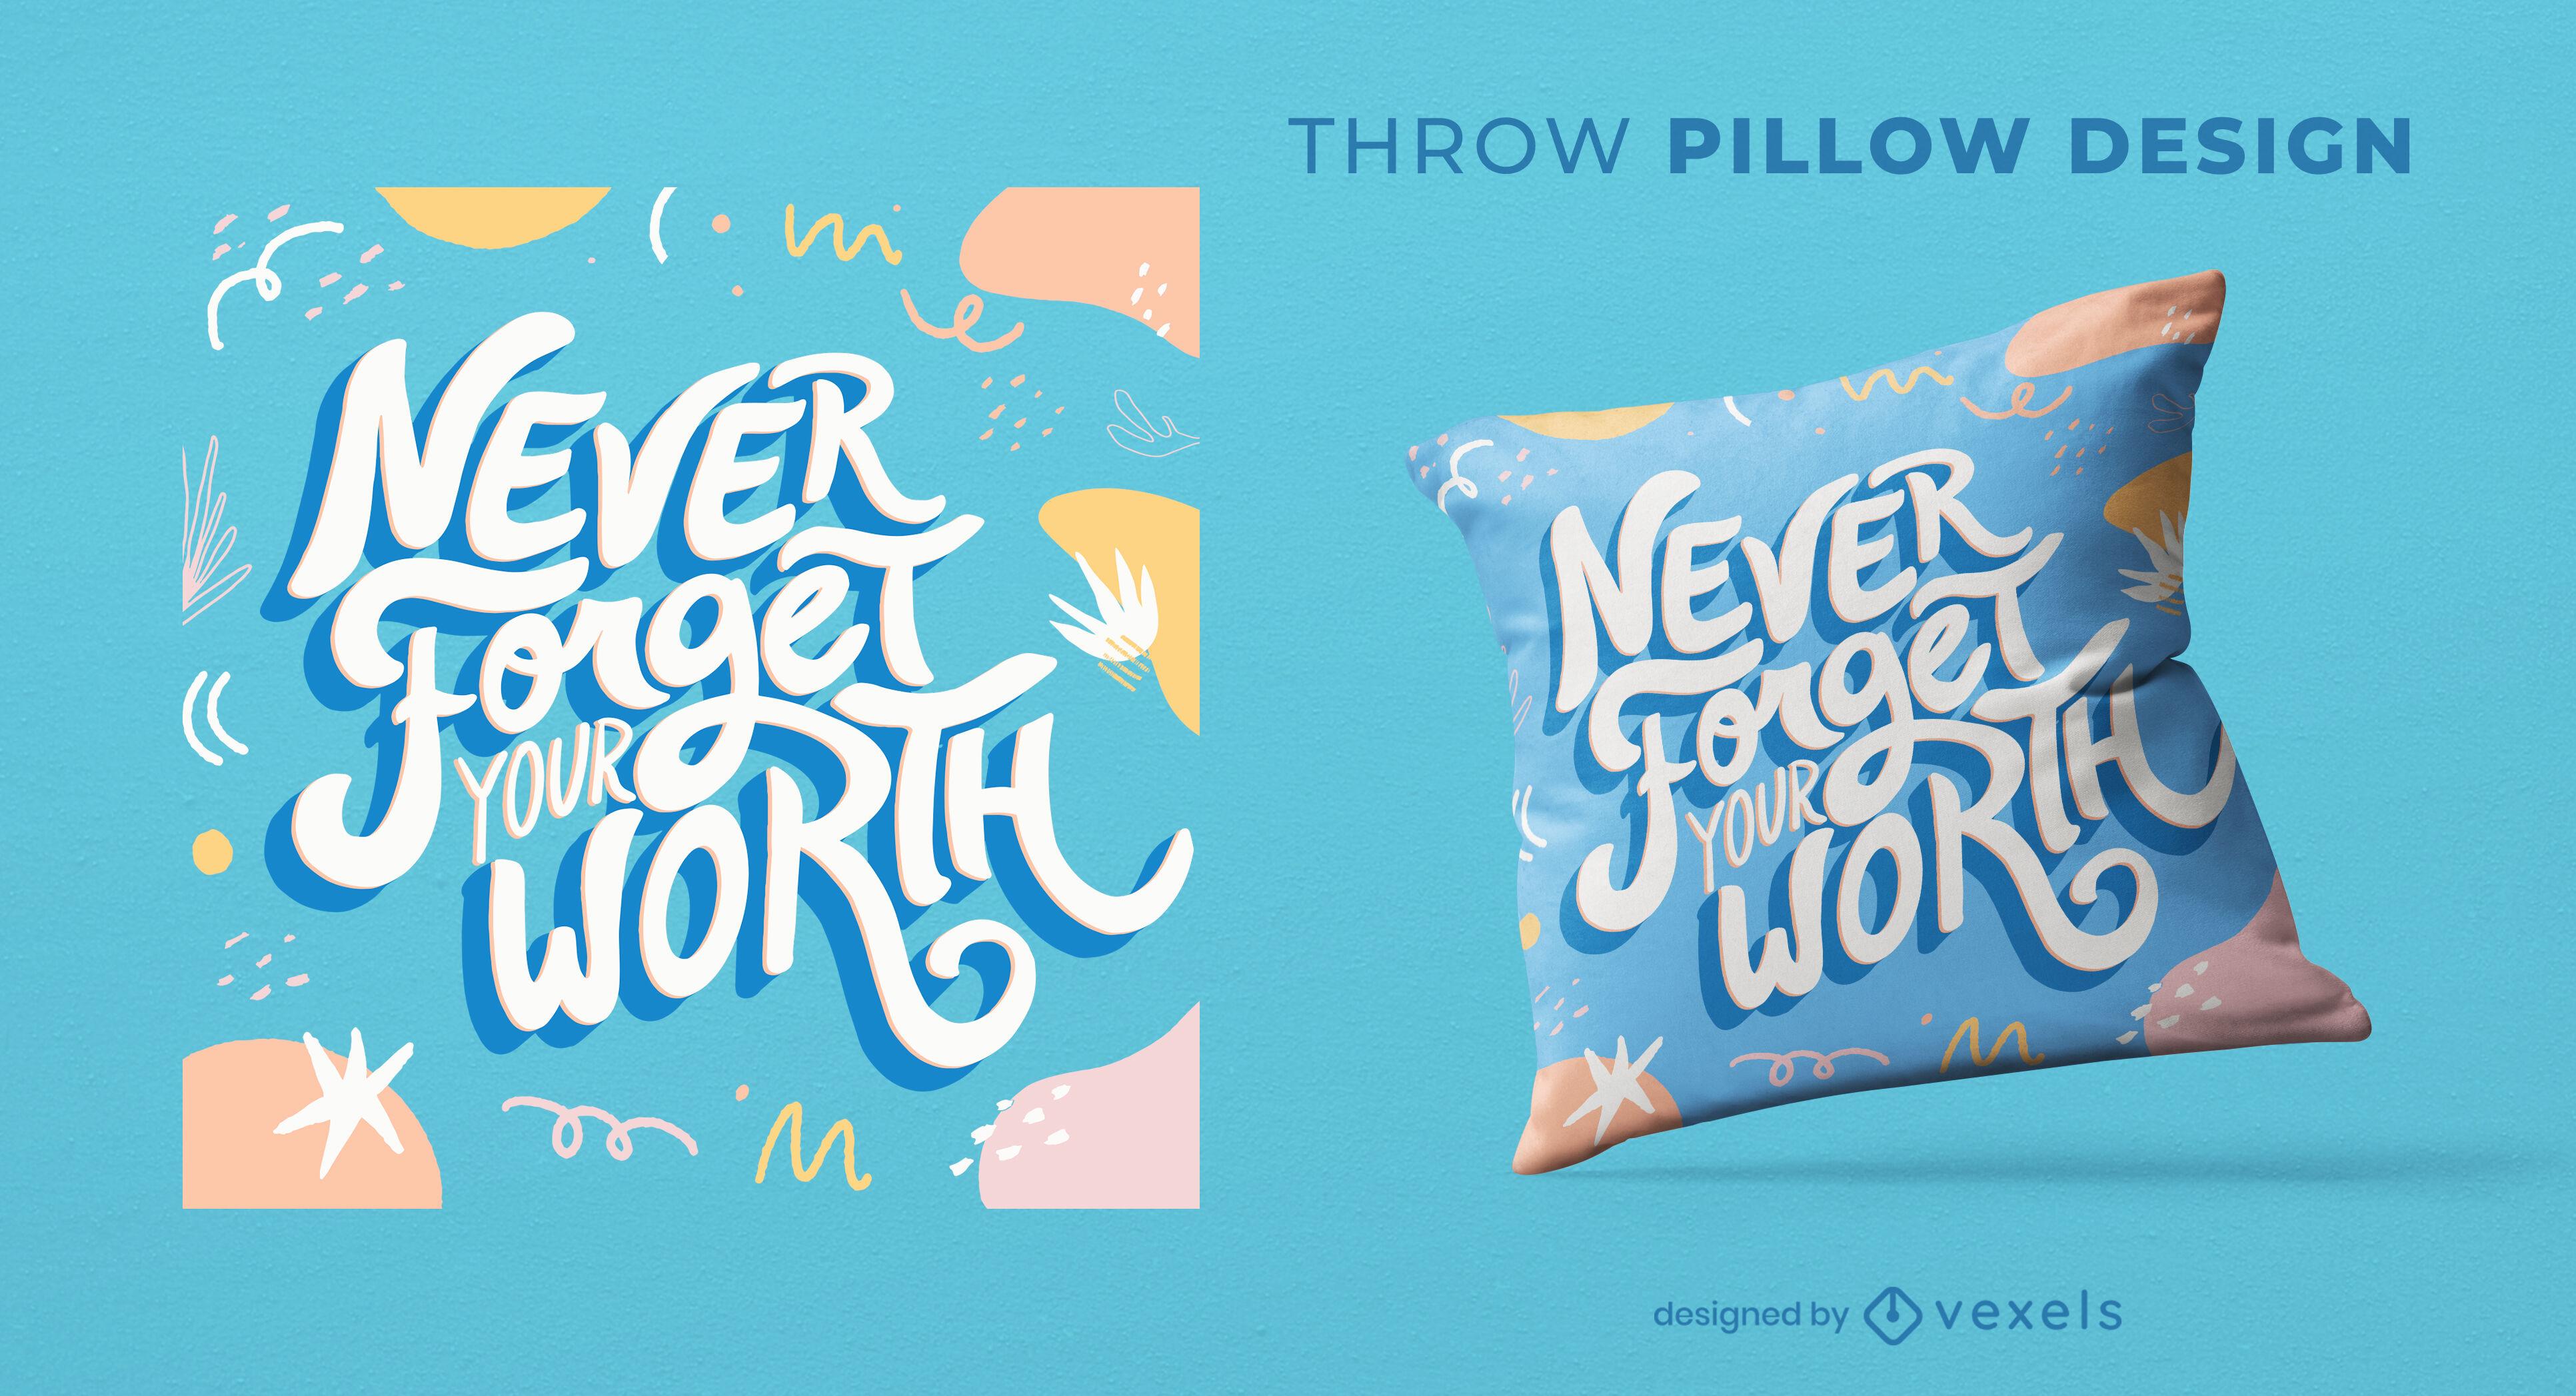 Motivational quote doodles throw pillow design